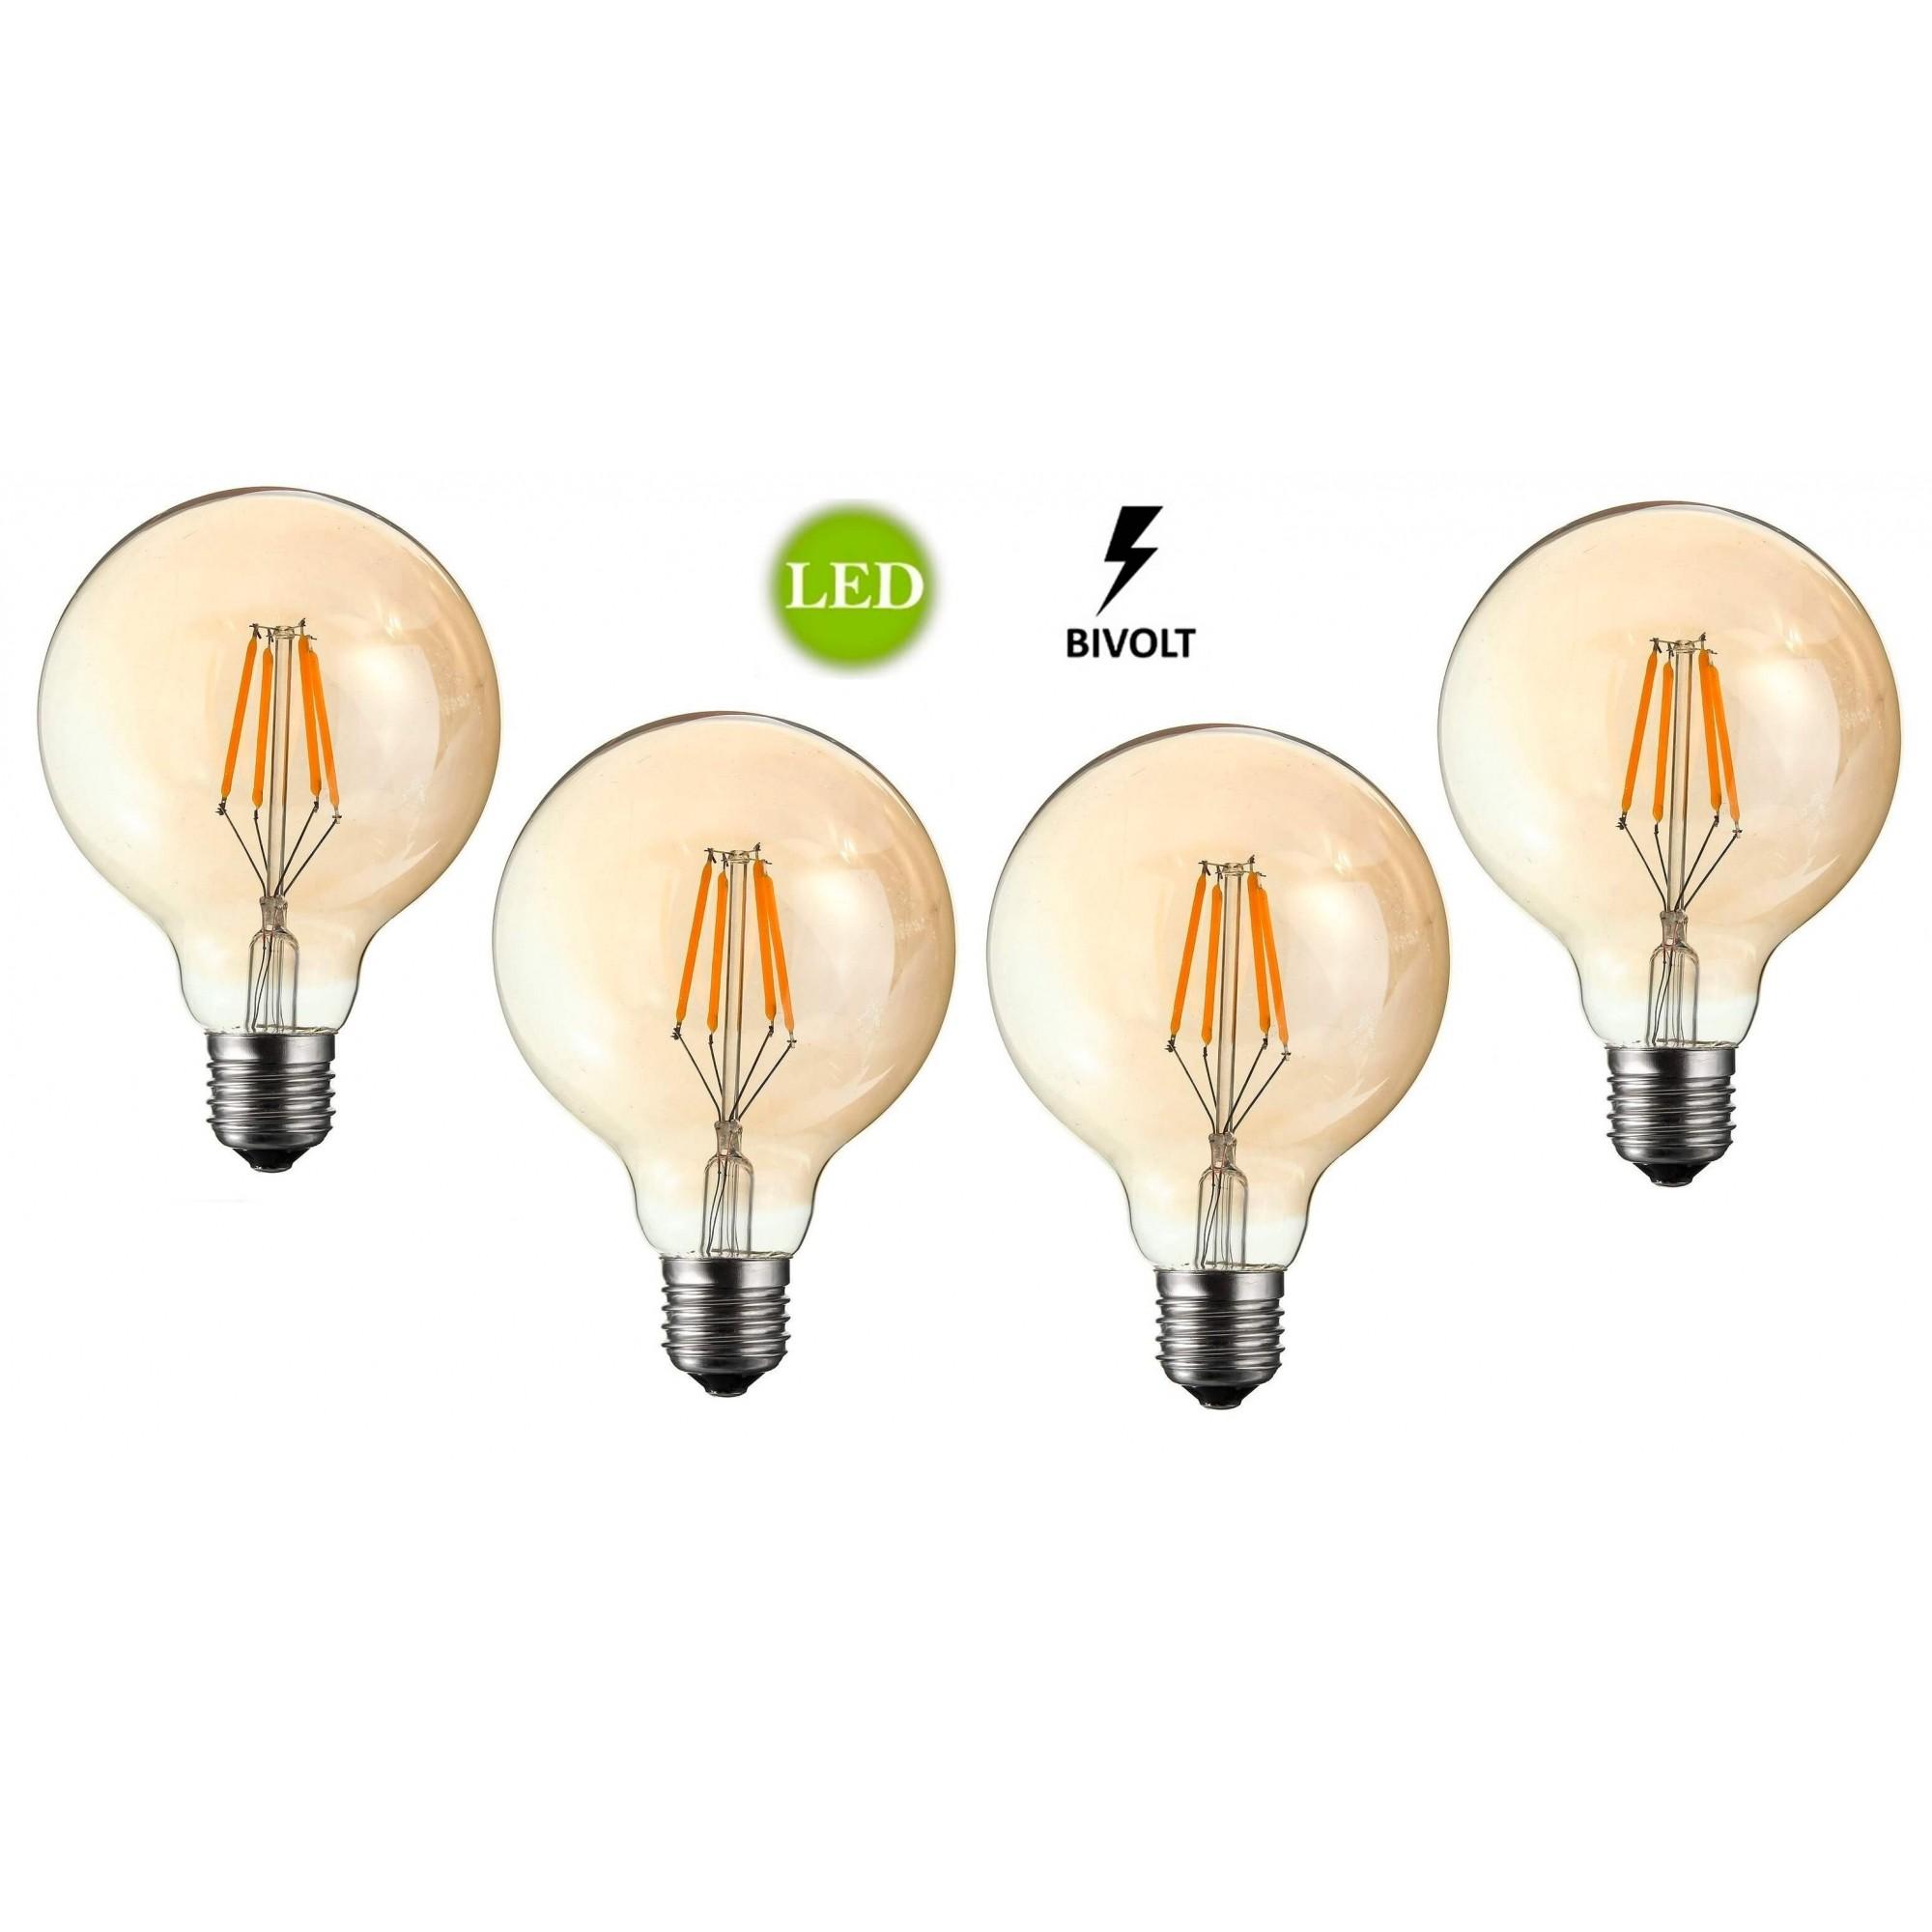 4 Lâmpadas Retrô LED G80 4W Bivolt